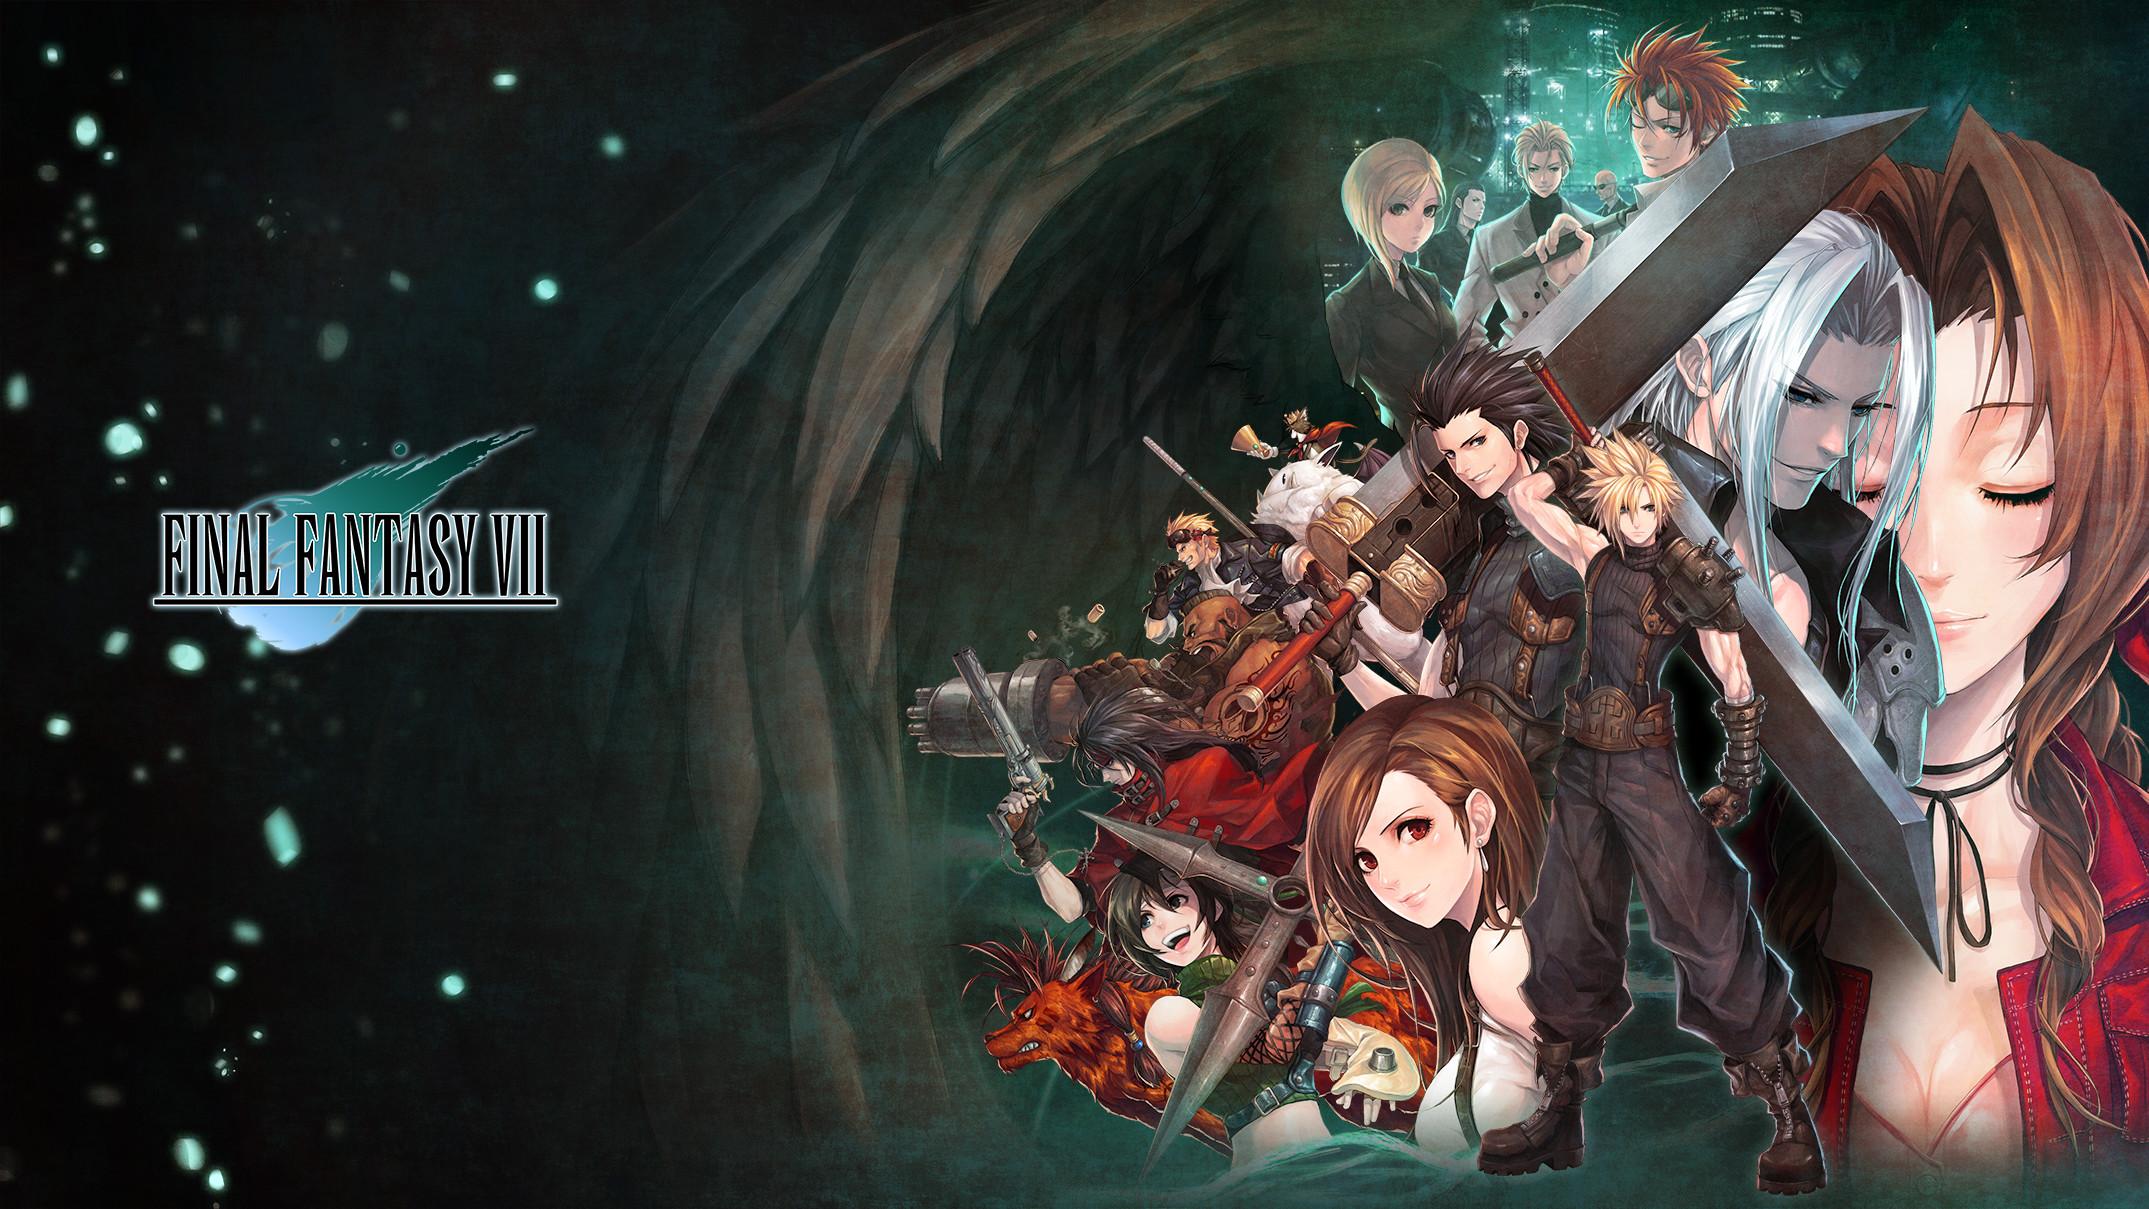 FF VIIAn amazing Final Fantasy 7 wallpaper by E.viL …